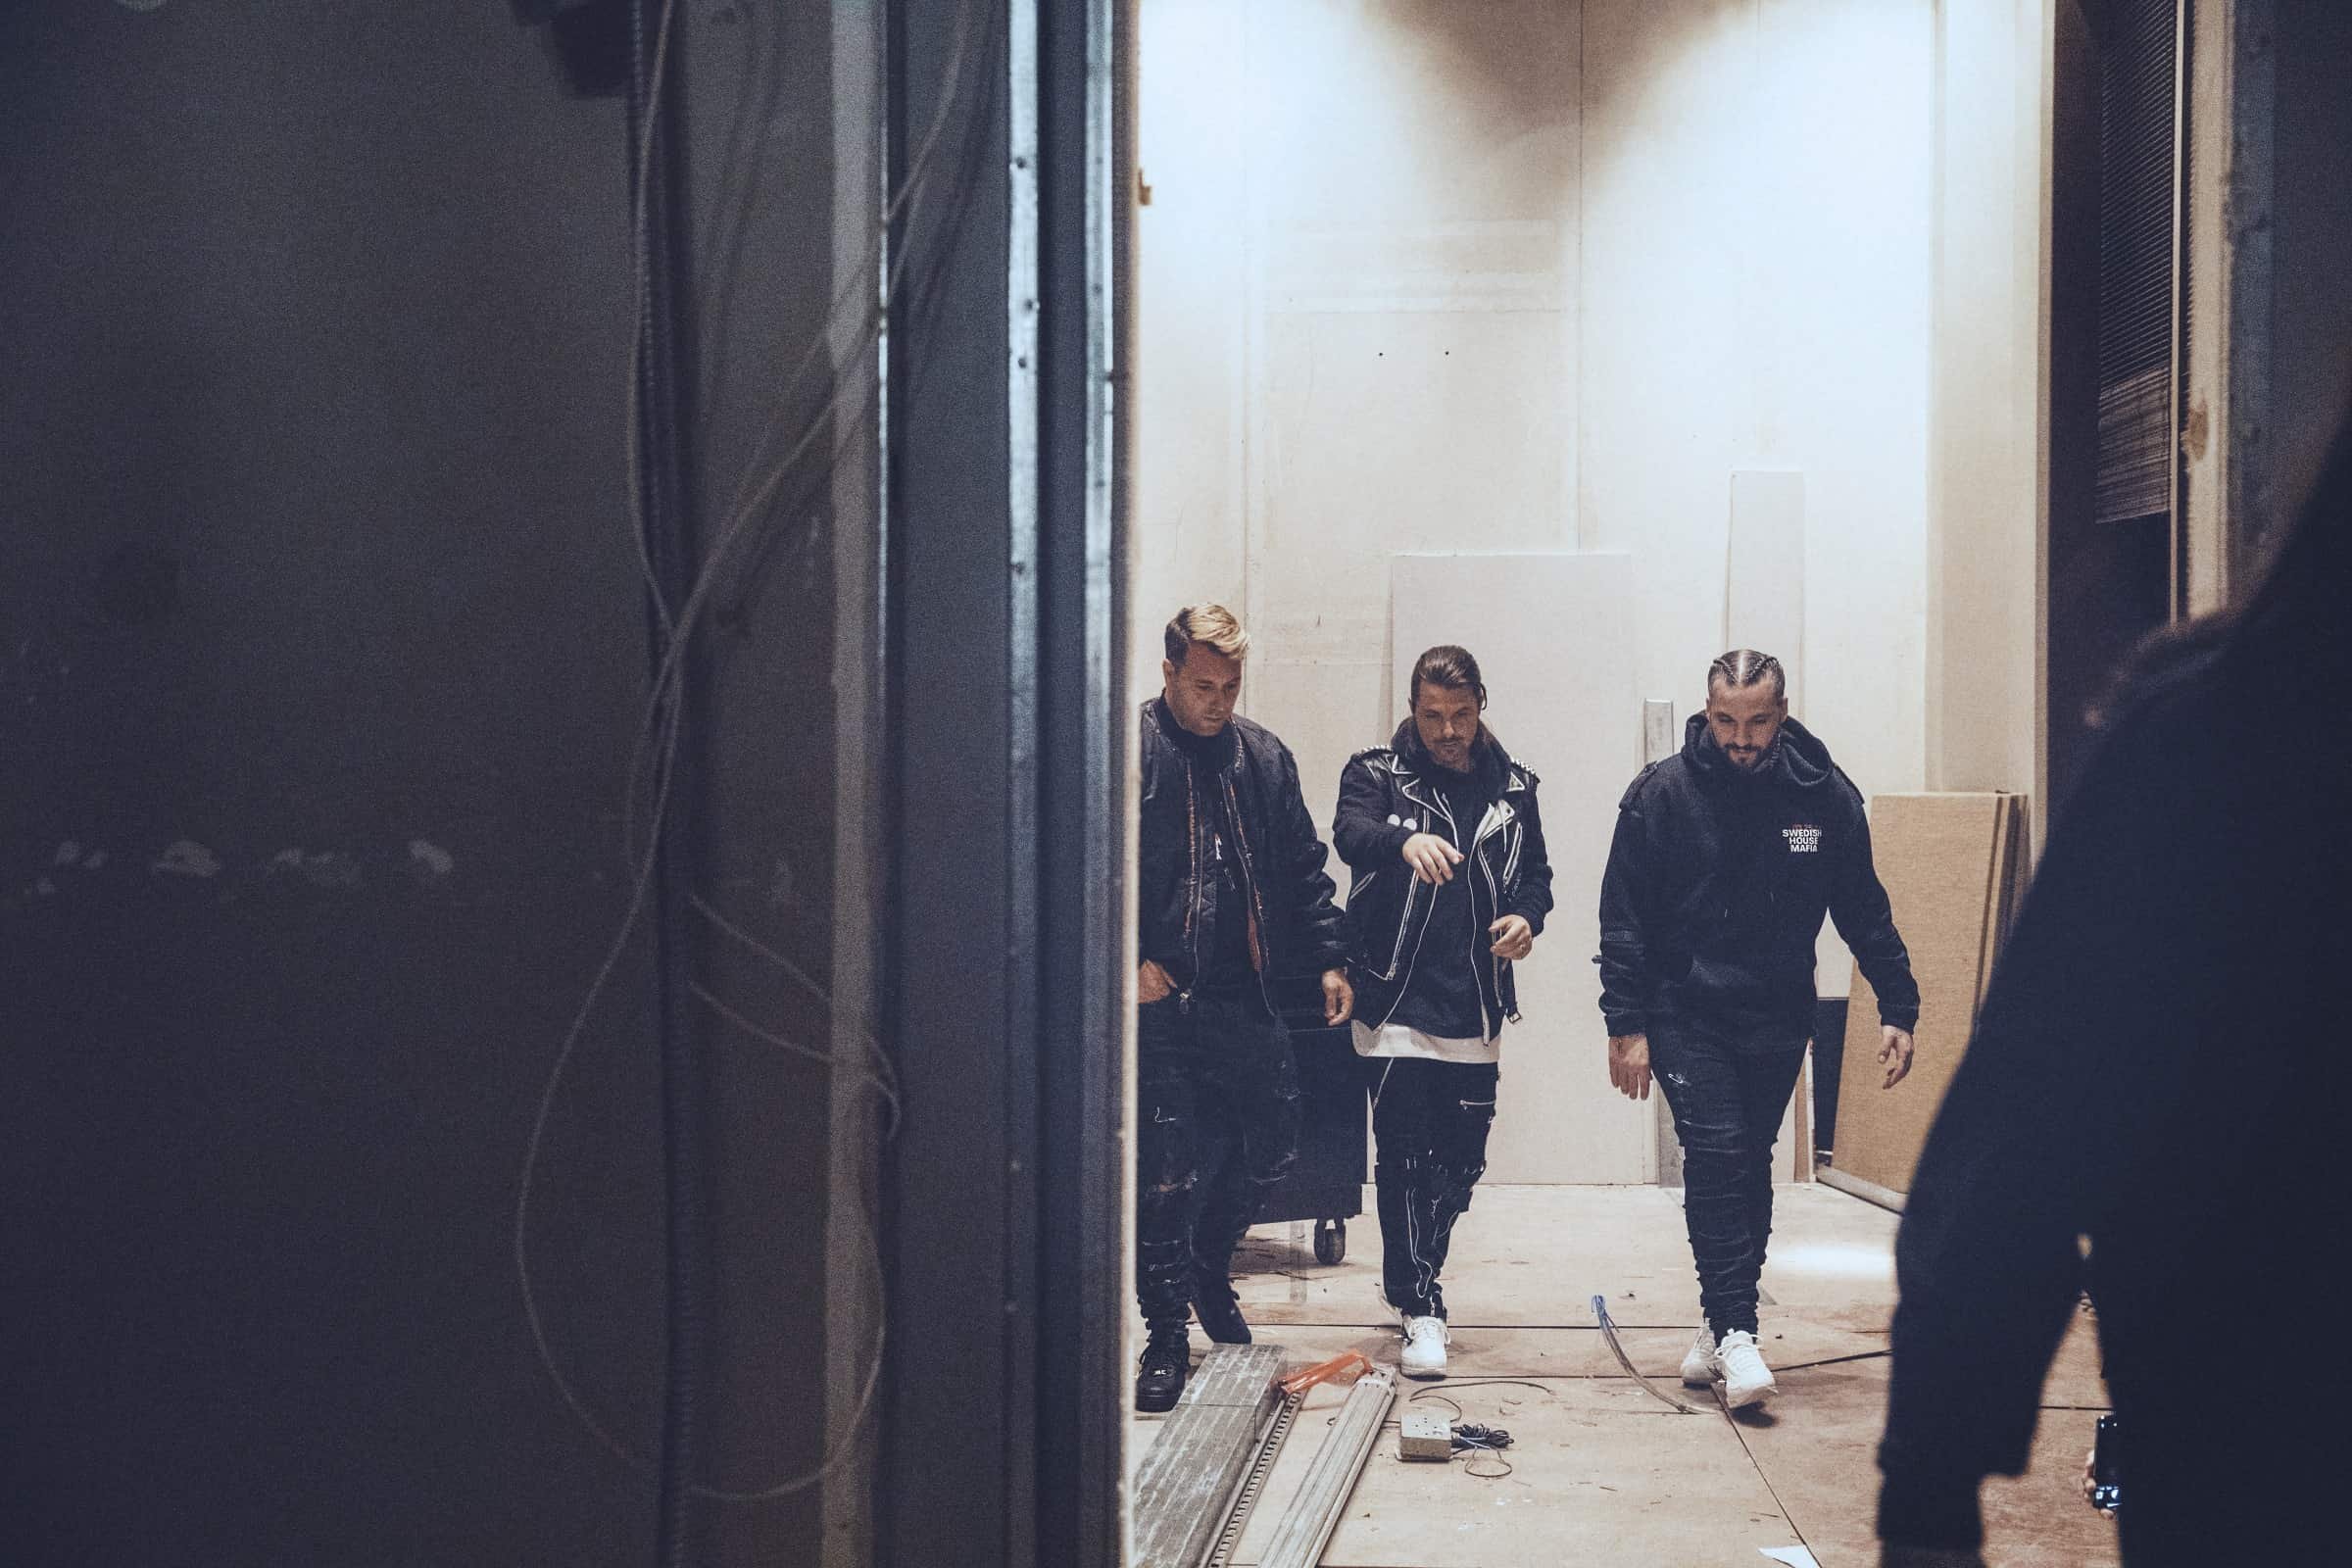 Watch Swedish House Mafia's fabled return to close Ultra 2018